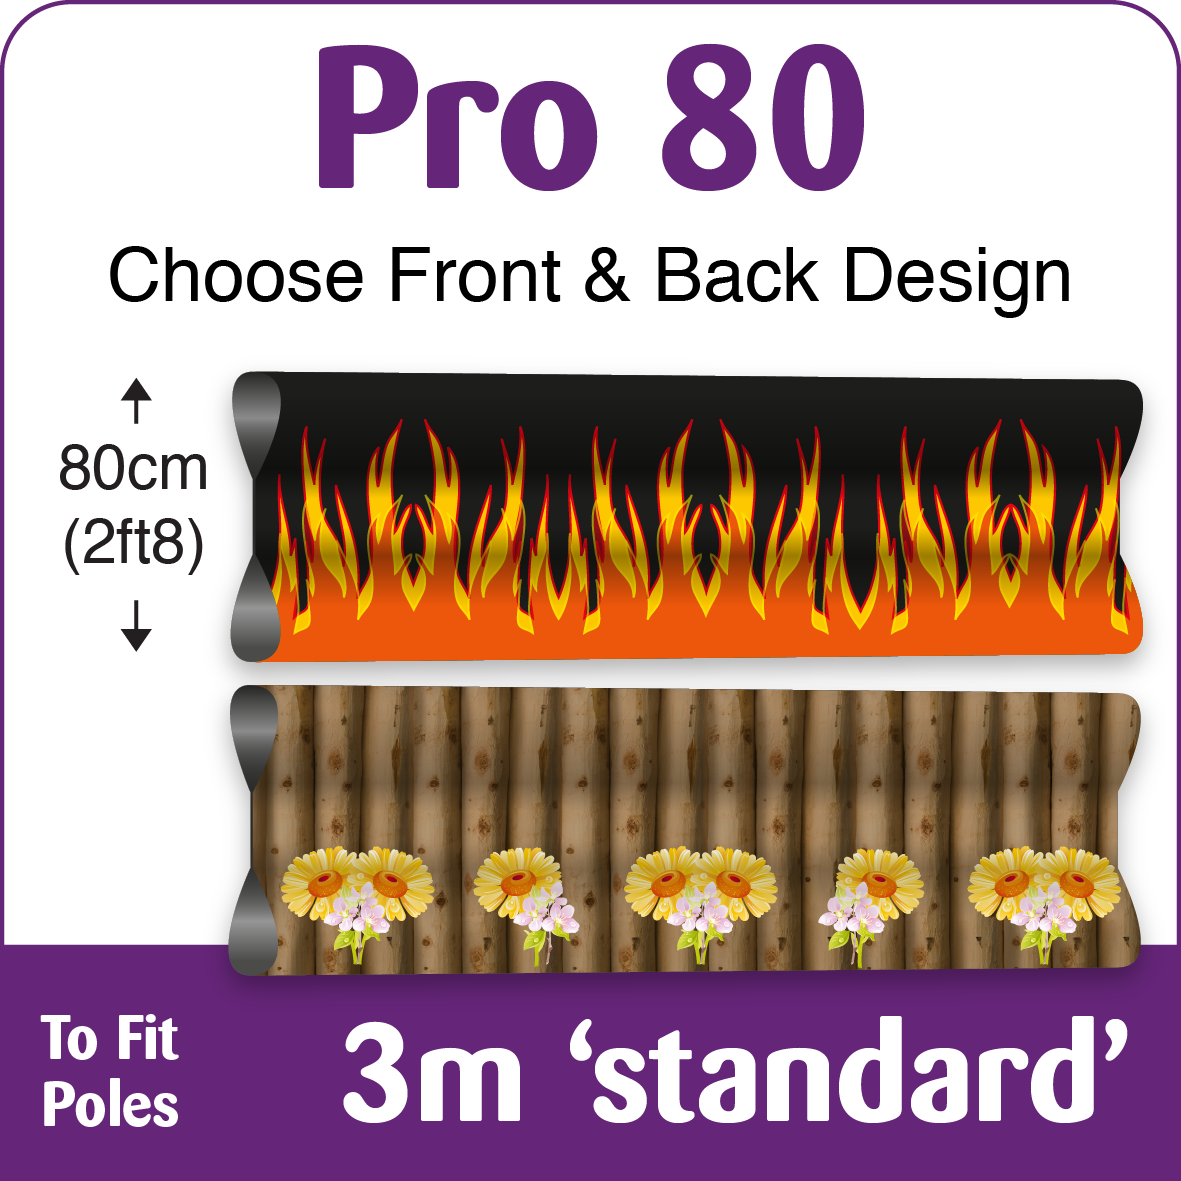 Pro80 Standard